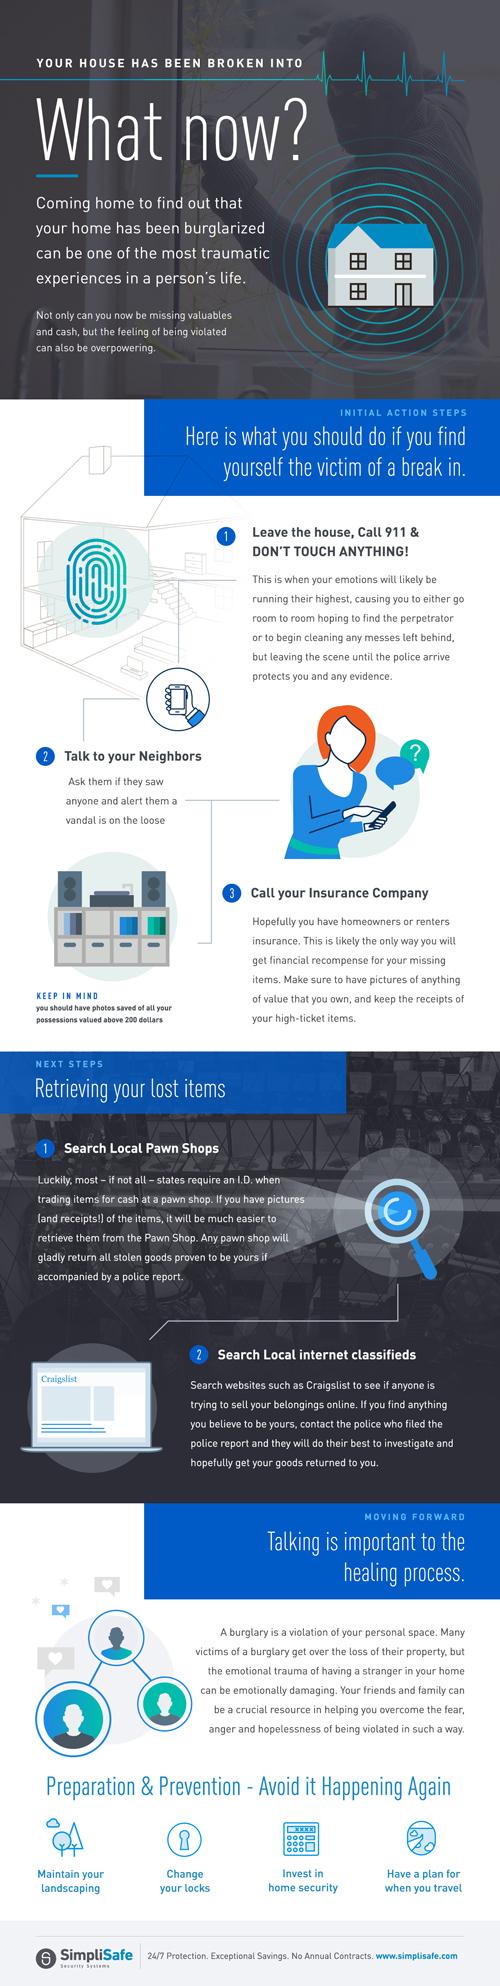 Simplisafe_Infographic